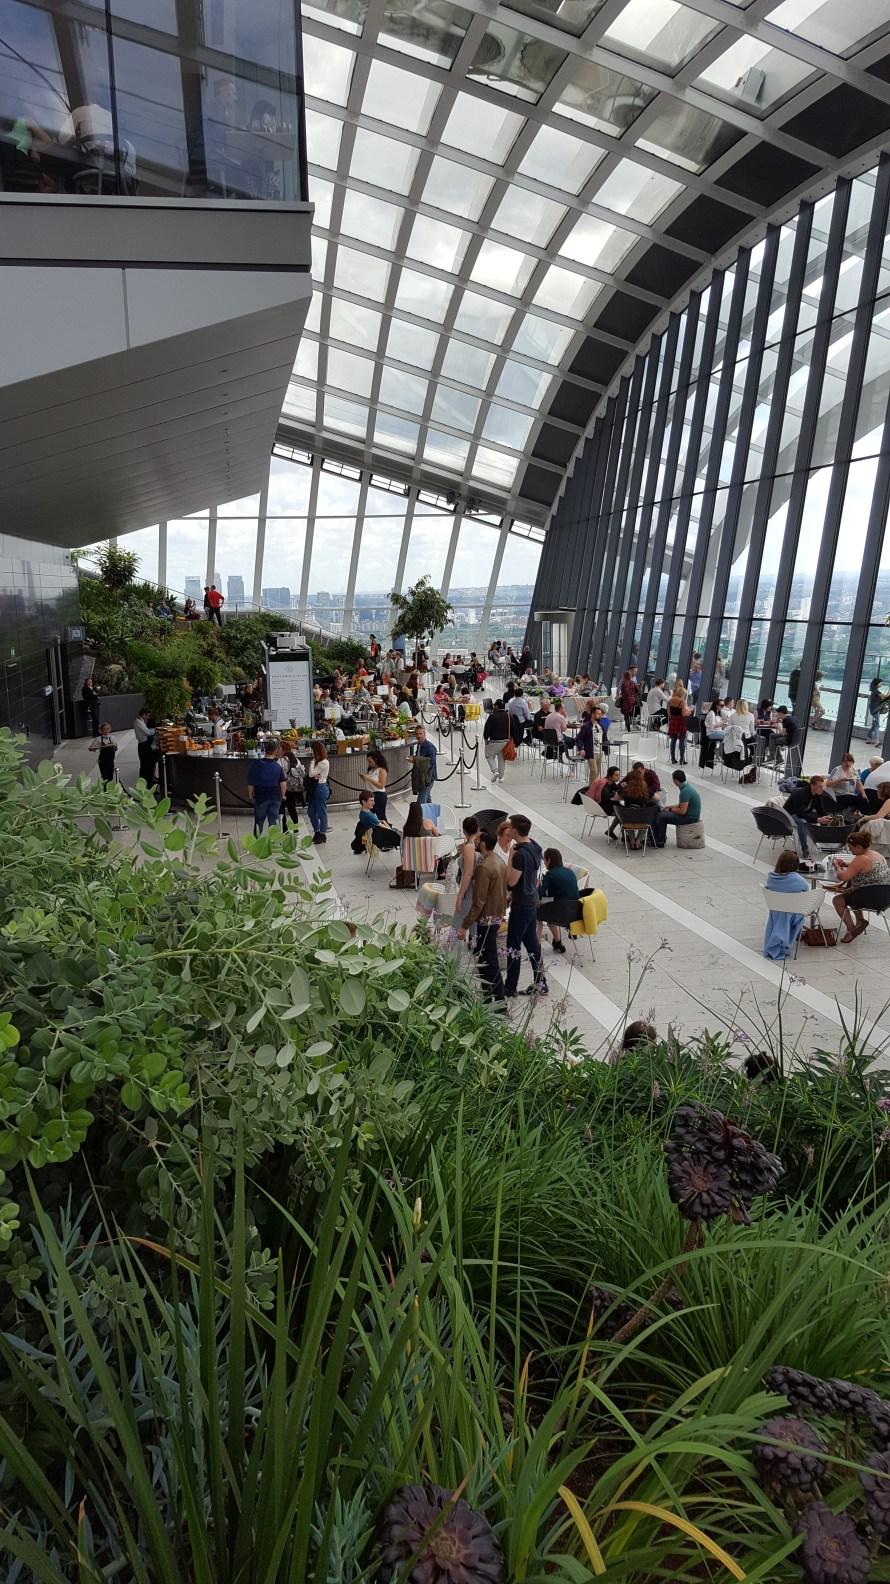 Tips for Visiting the Sky Garden London